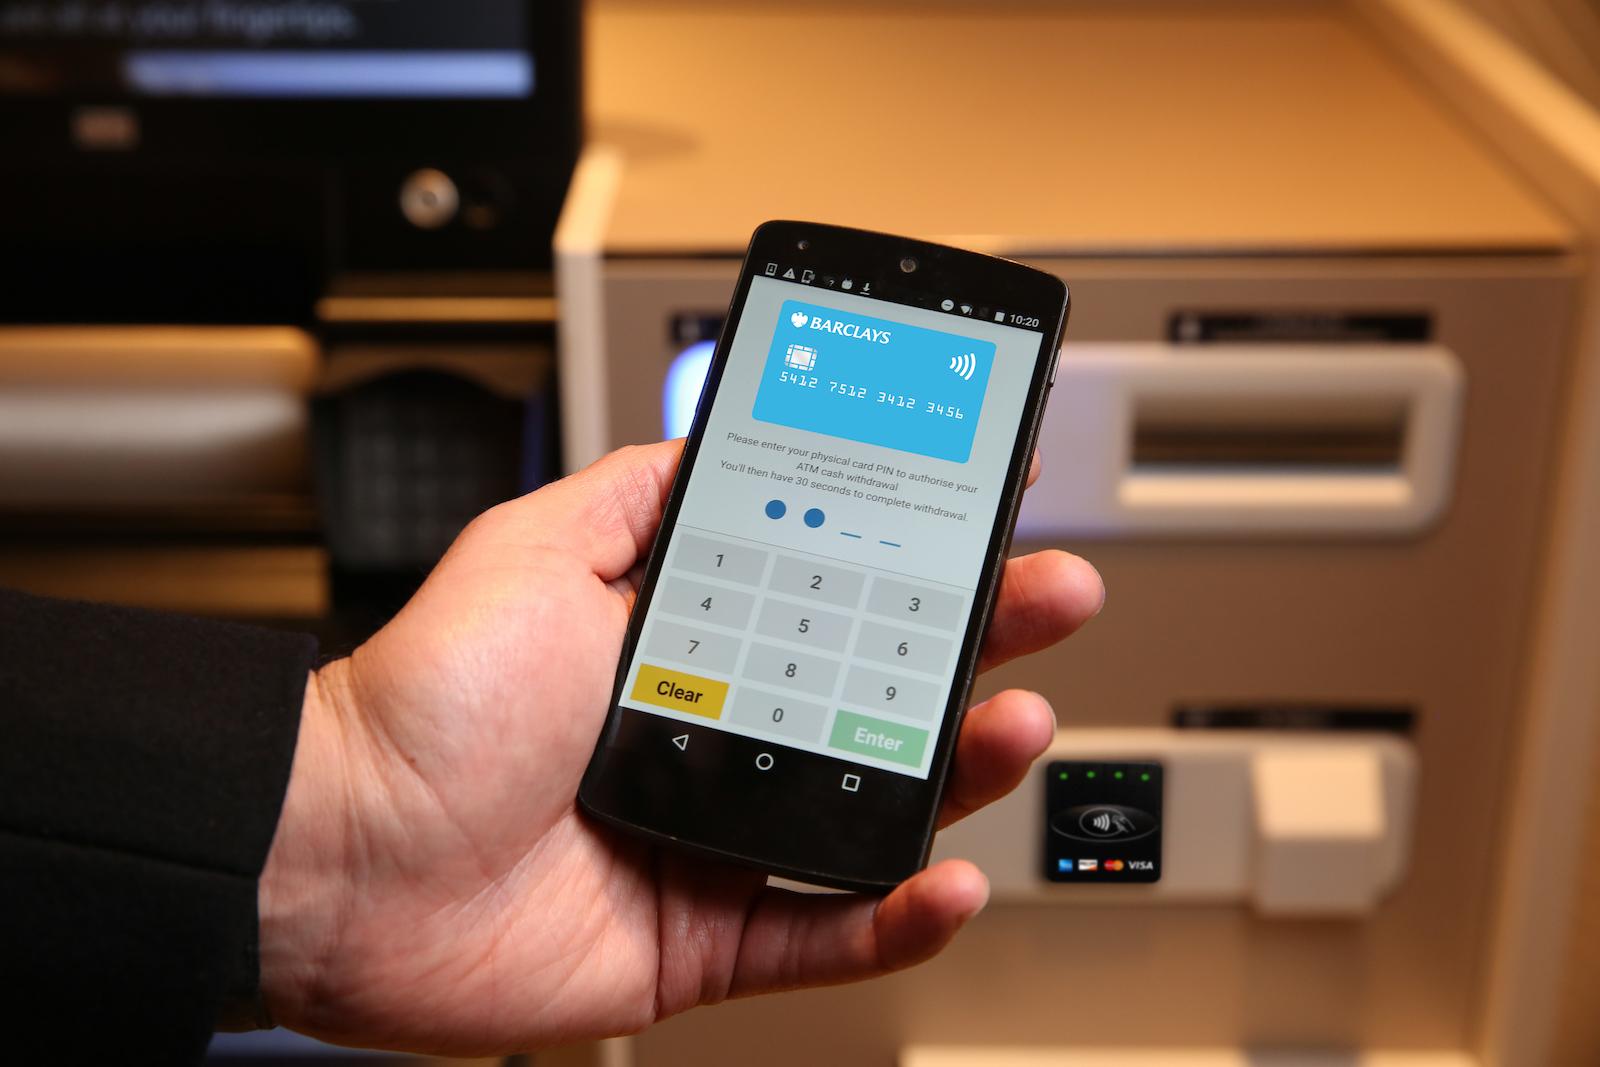 Barclays contactless cash app